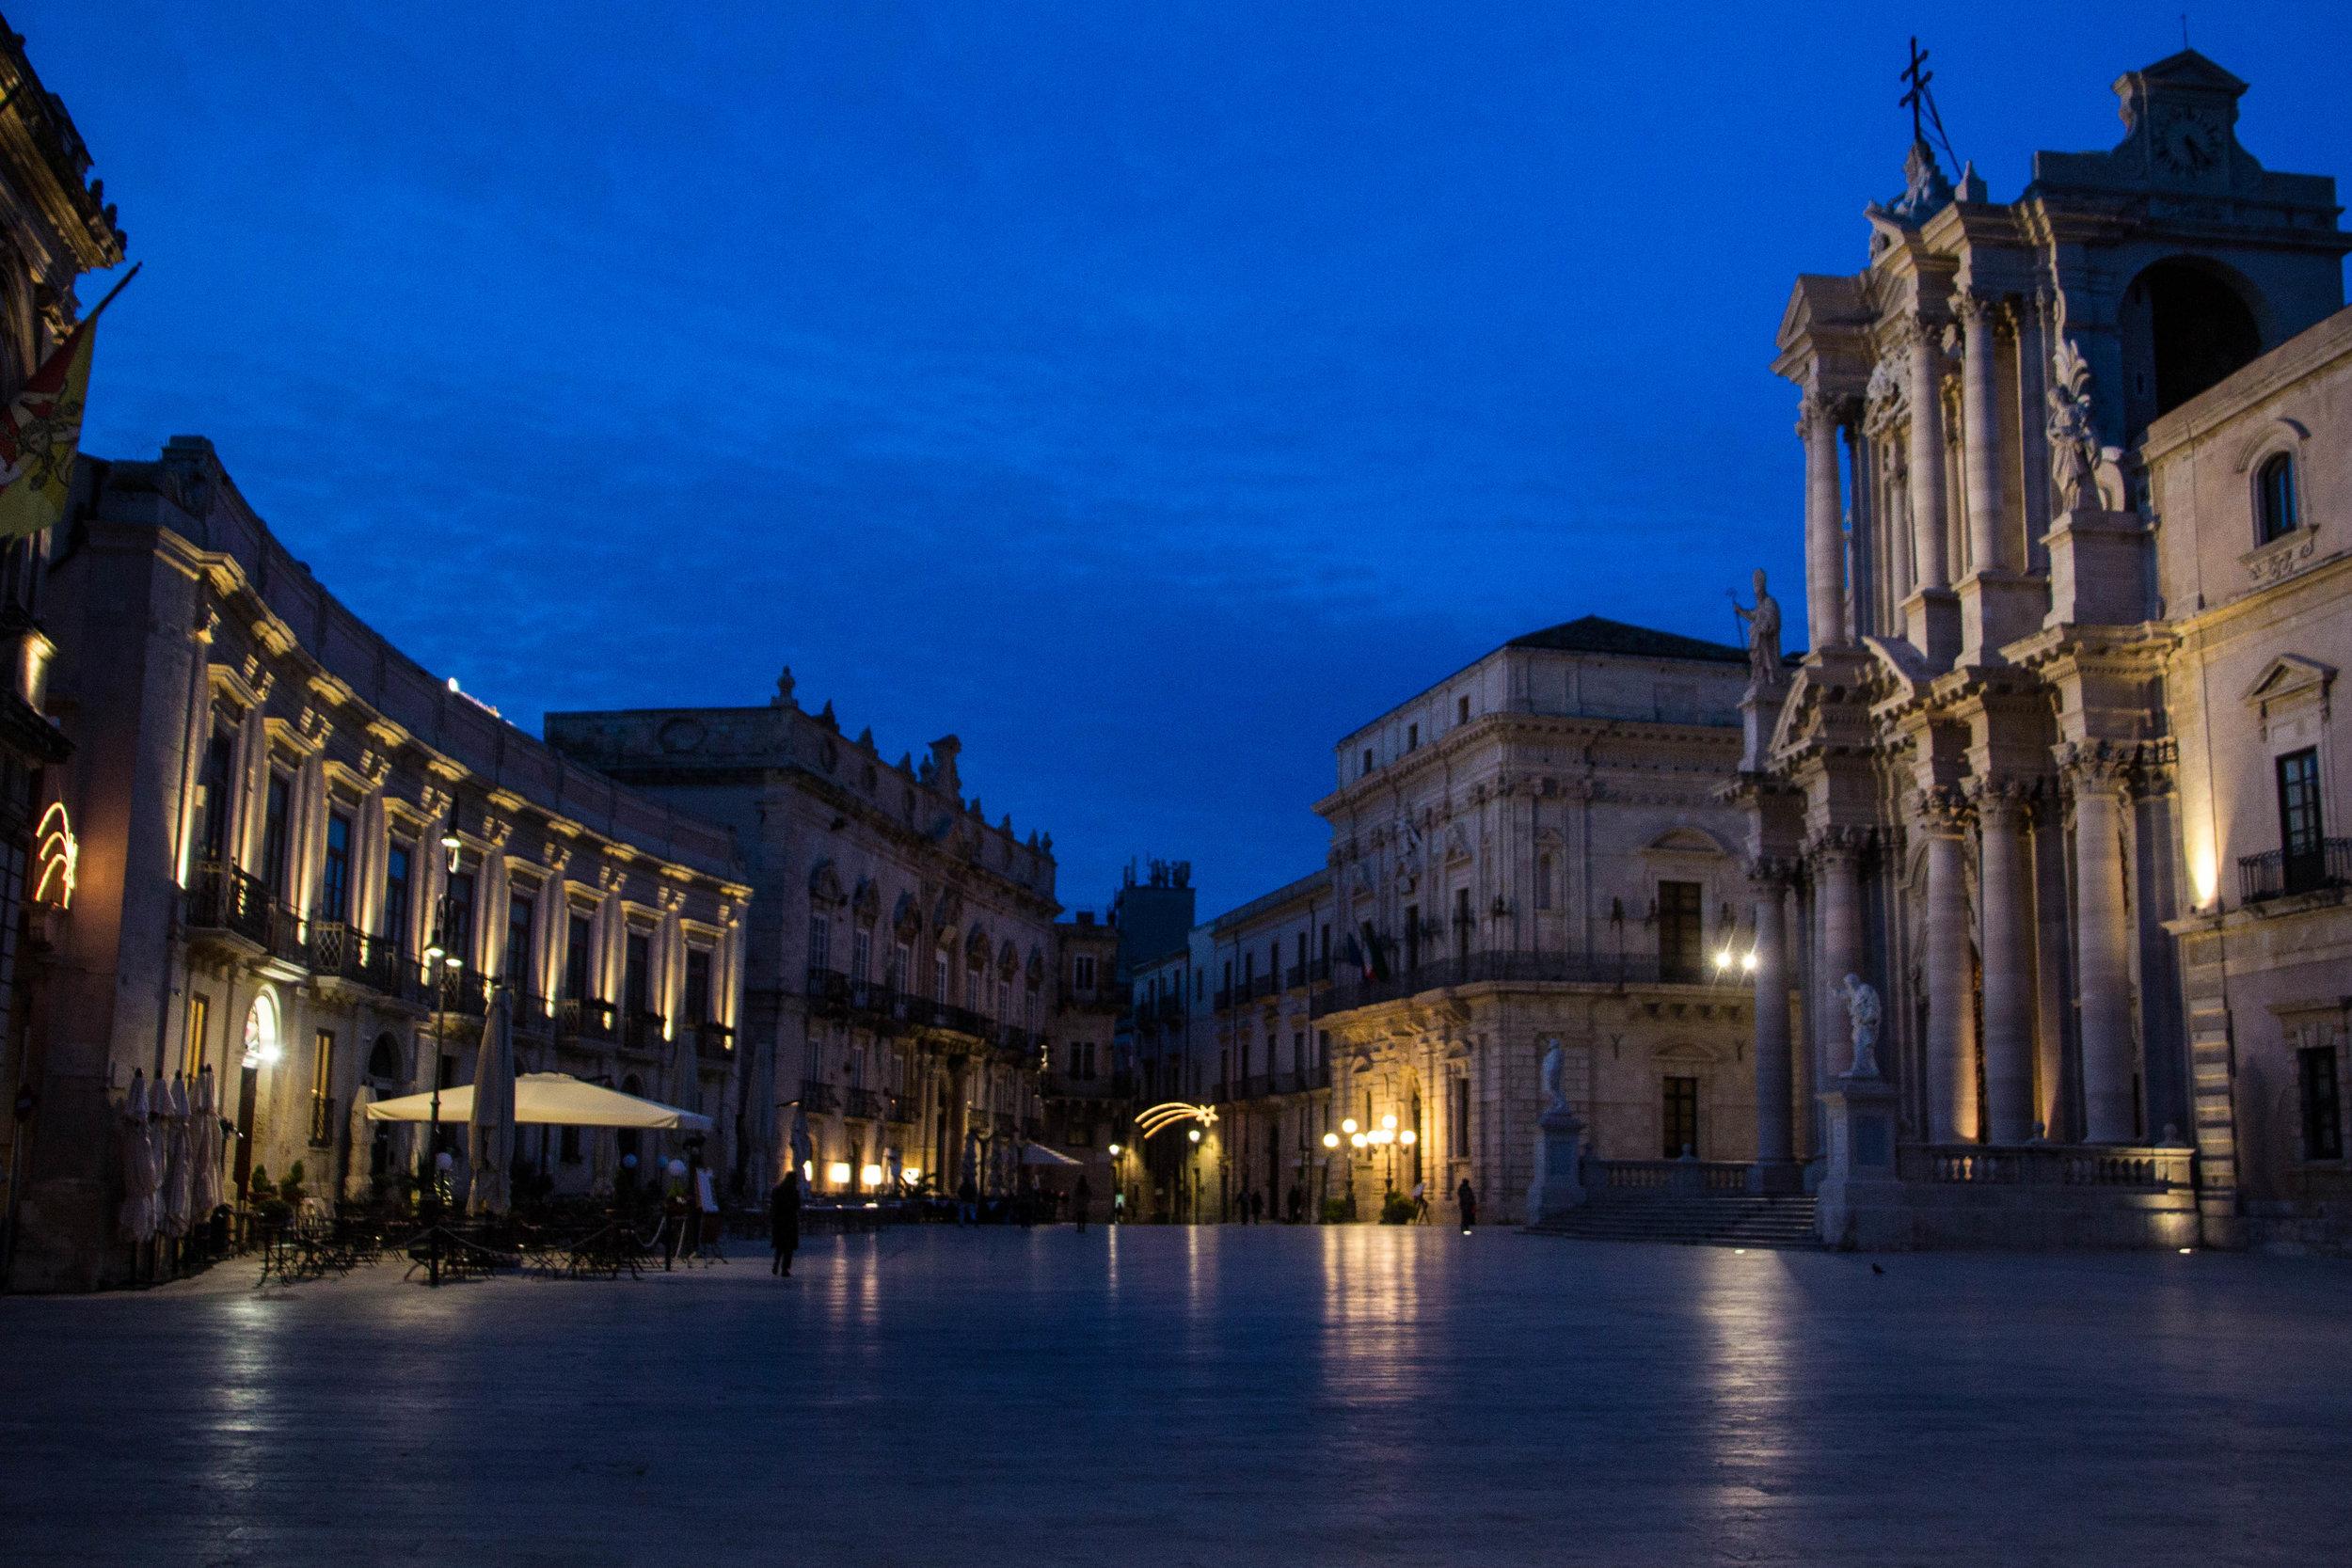 piazza-duomo-sunset-ortygia-syracuse-sicily-31.jpg